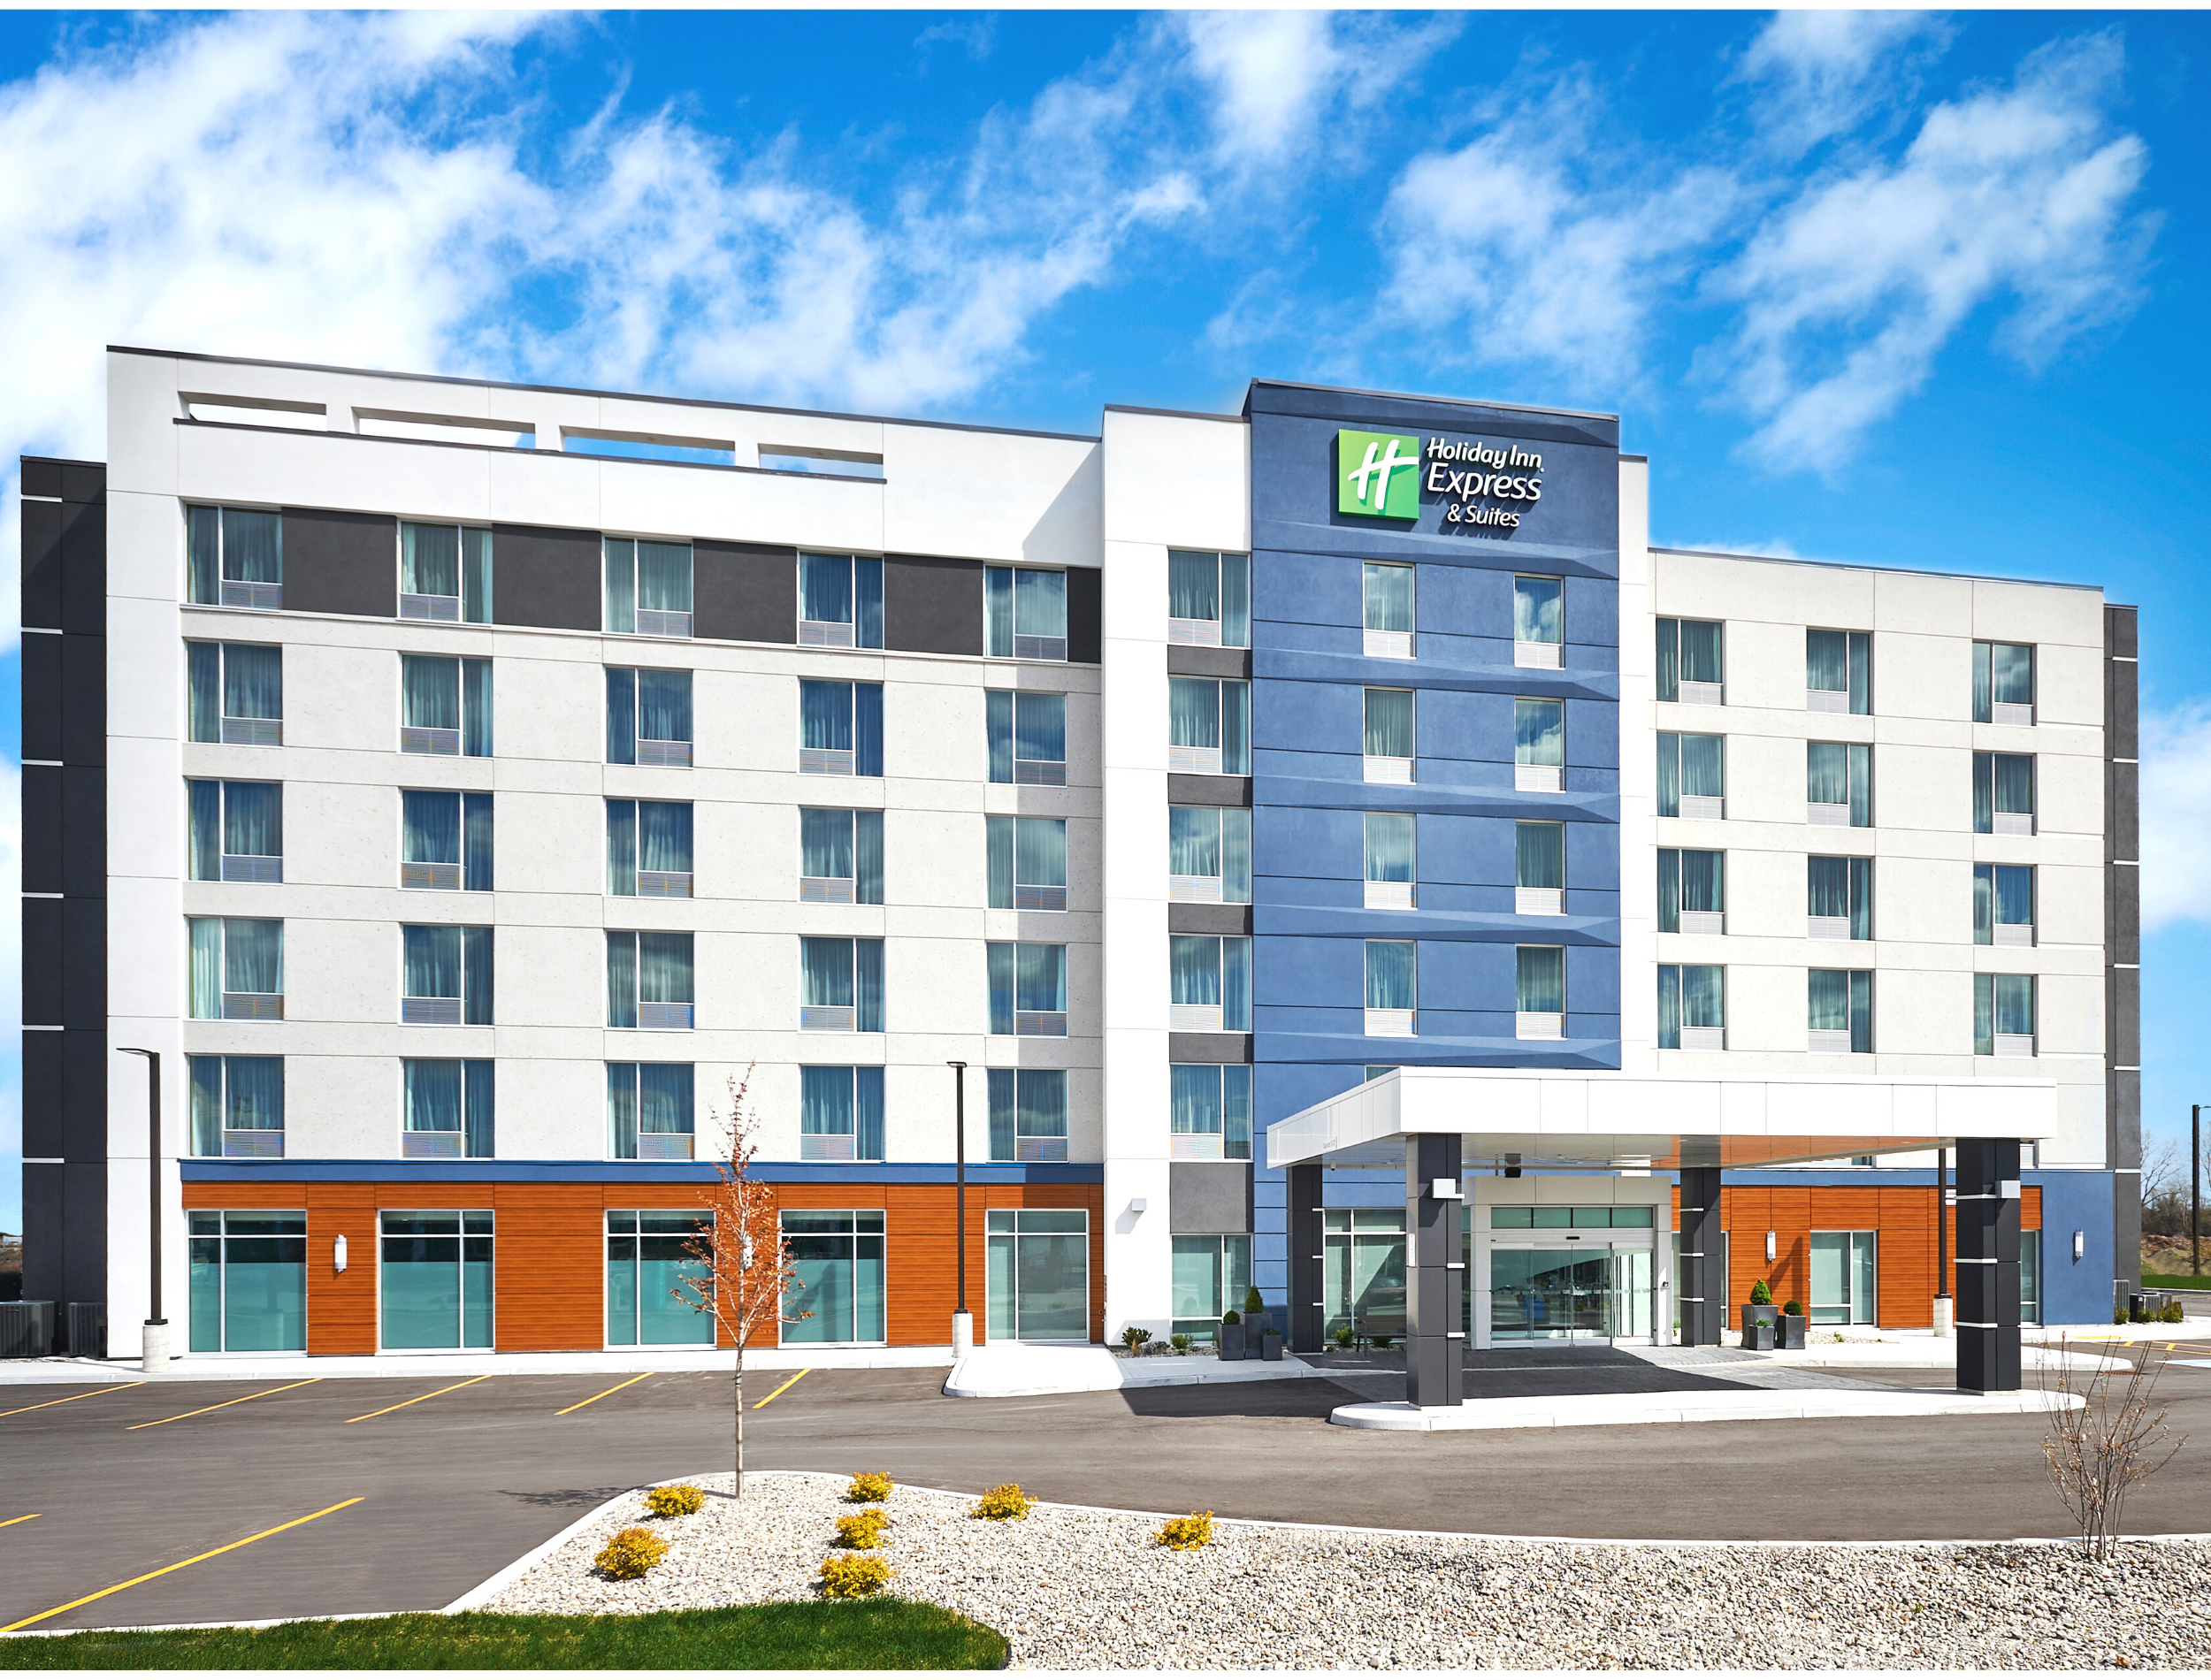 The Holiday Inn Express Hotel, Lakeshore, Ontario